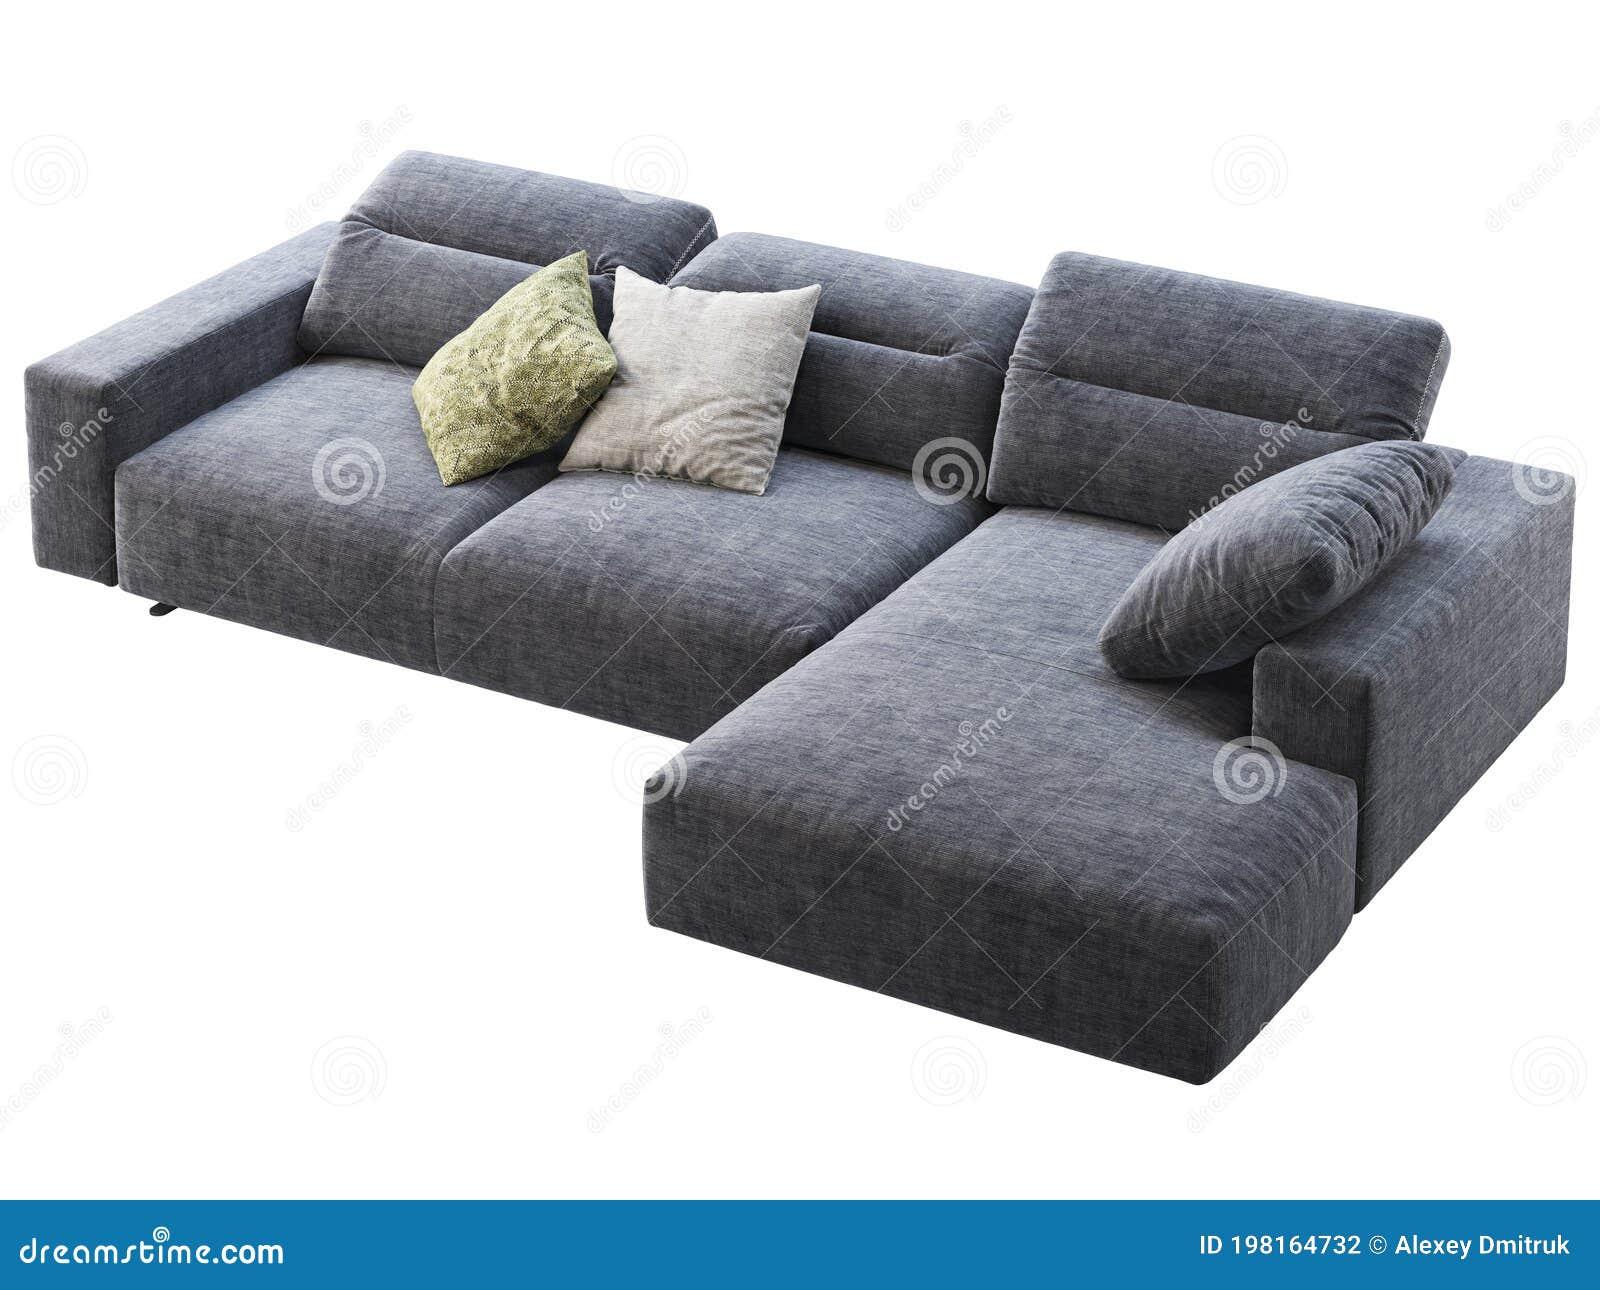 Modern Dark Blue Fabric Chaise Lounge Sofa With Adjustable Backrest 3d Render Stock Illustration Illustration Of Colorful Model 198164732